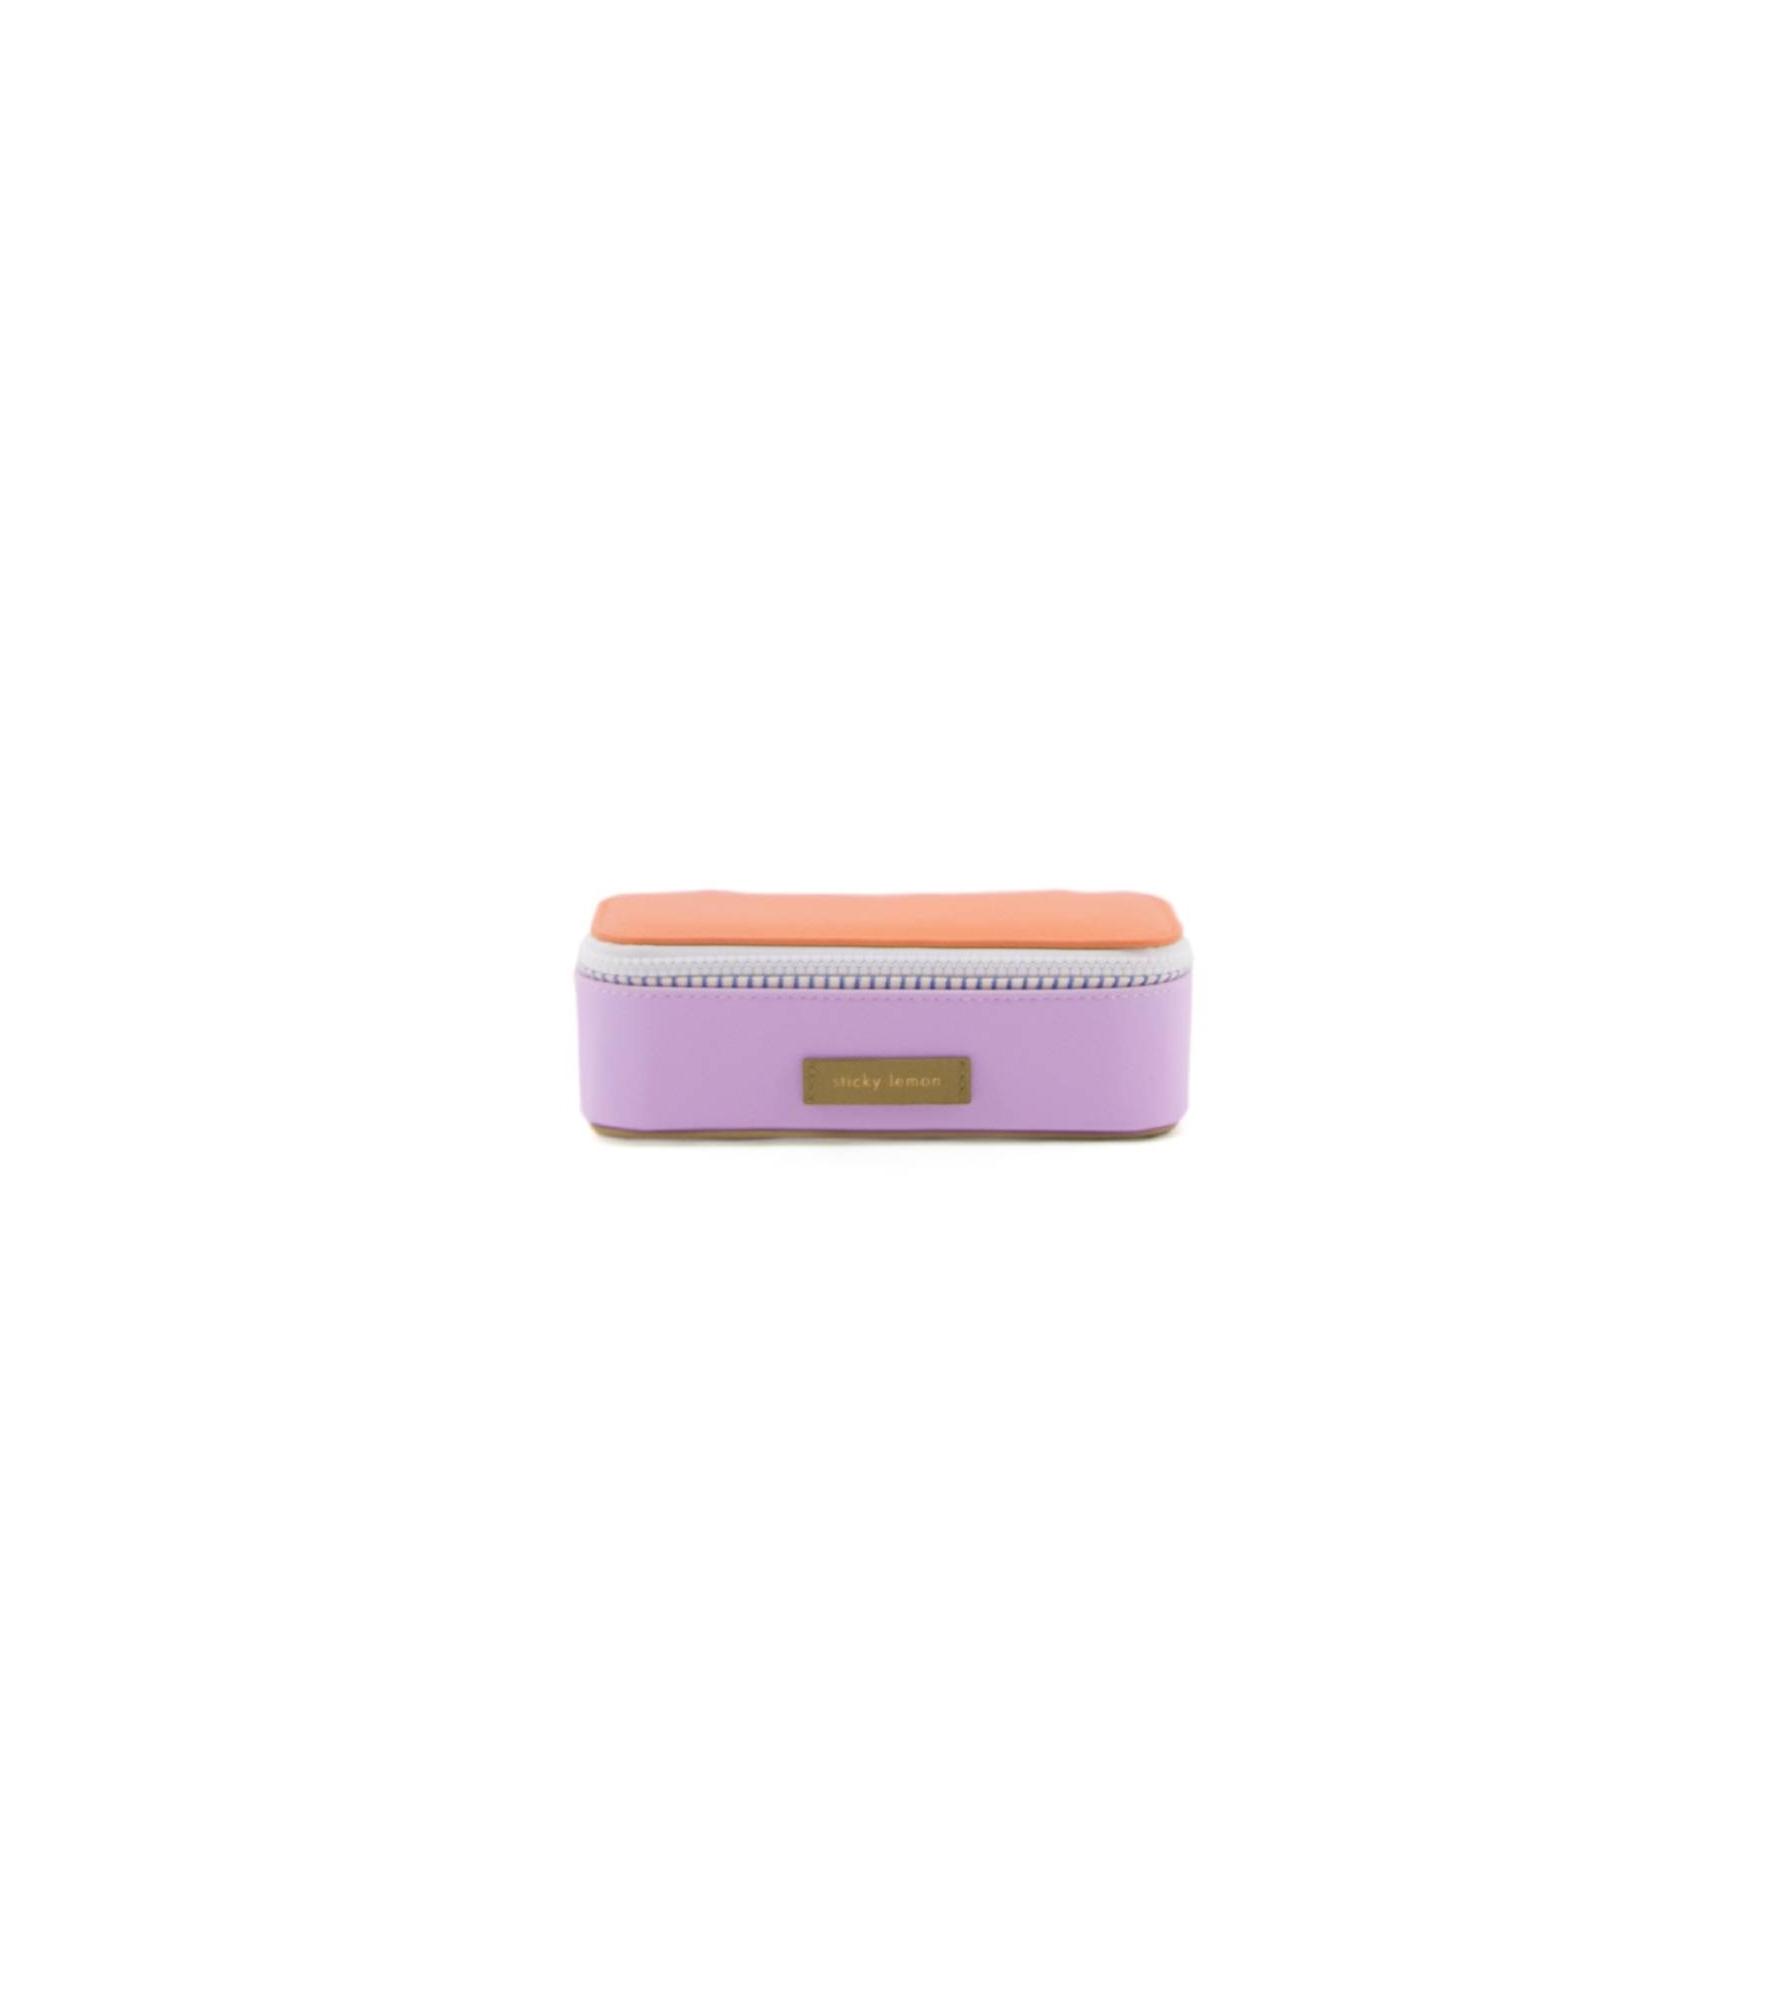 1801421 - Sticky Lemon - pencilbox - Madam olive, gustave lilac, concierge orange - front_edit.jpg